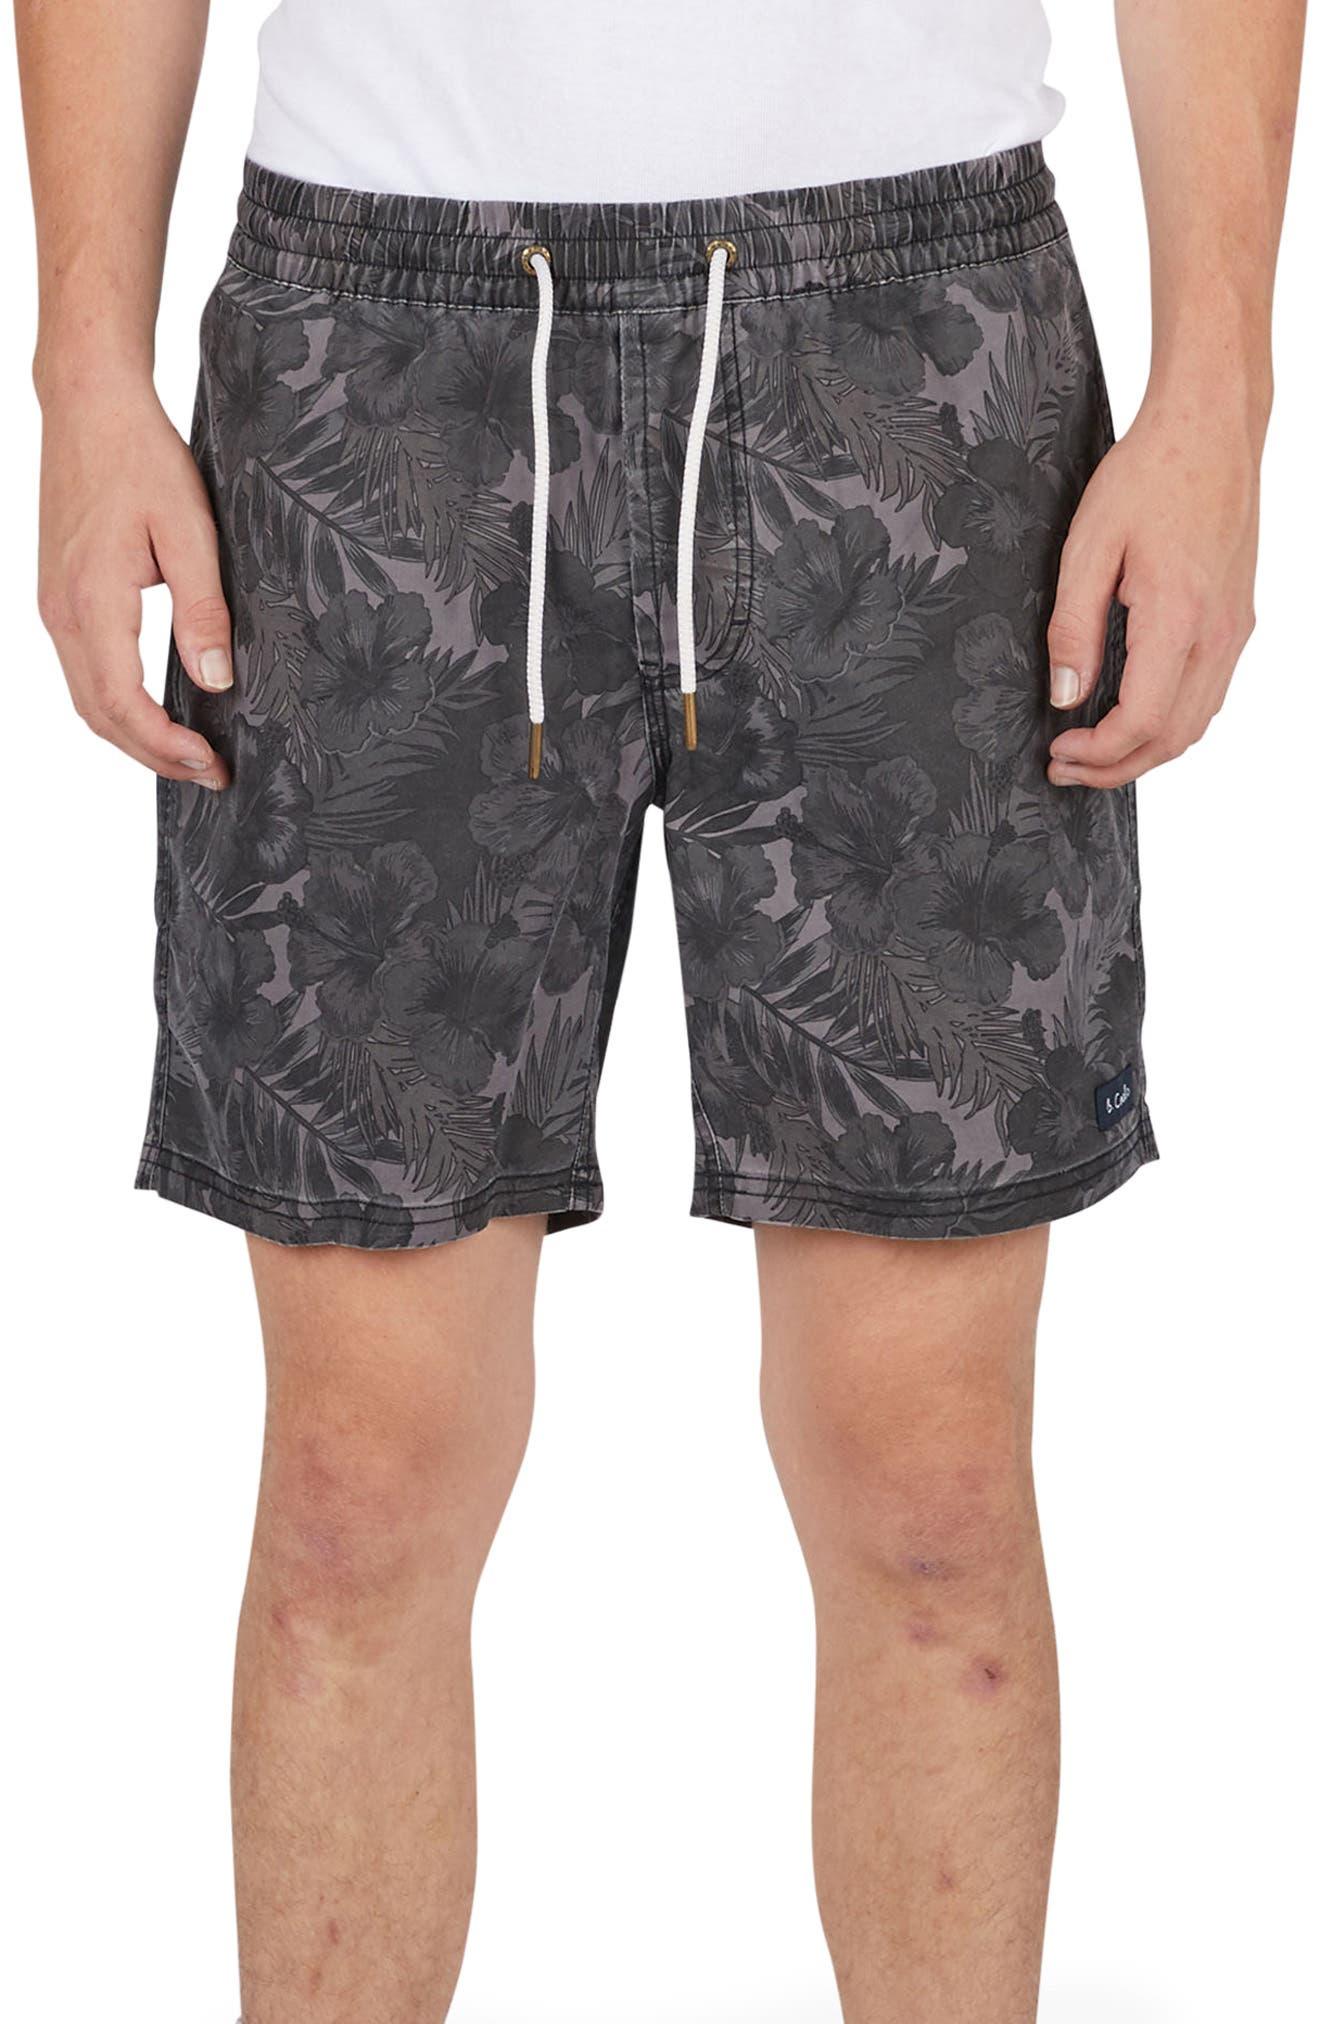 Amphibious Shorts,                             Main thumbnail 1, color,                             001